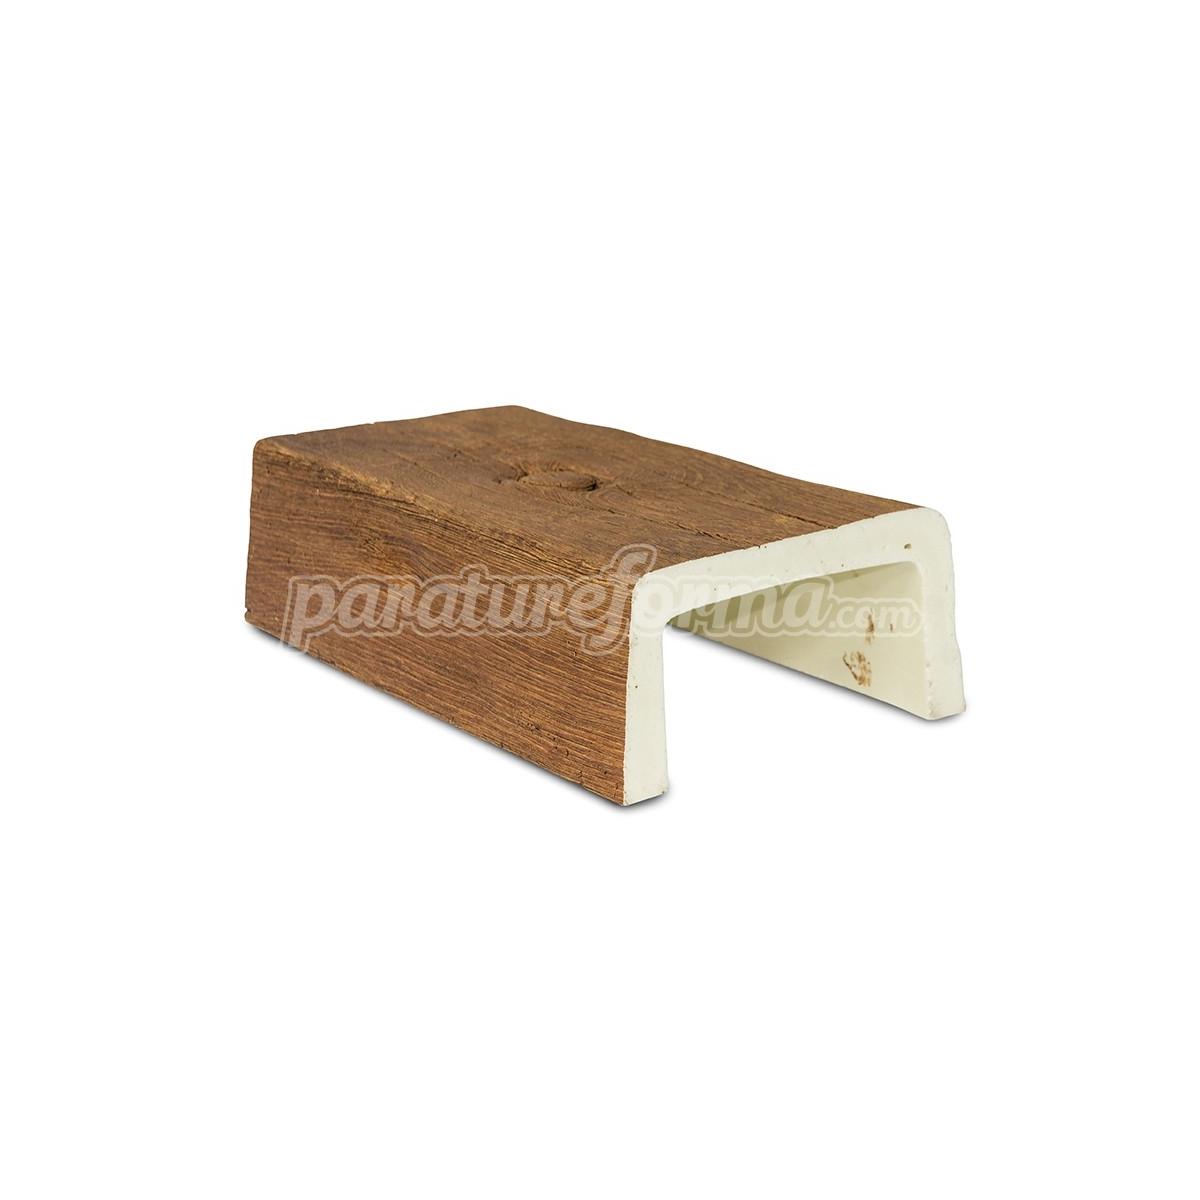 Viga imitación a madera 300x14,5x8 - Vigas imitación madera cuadradas